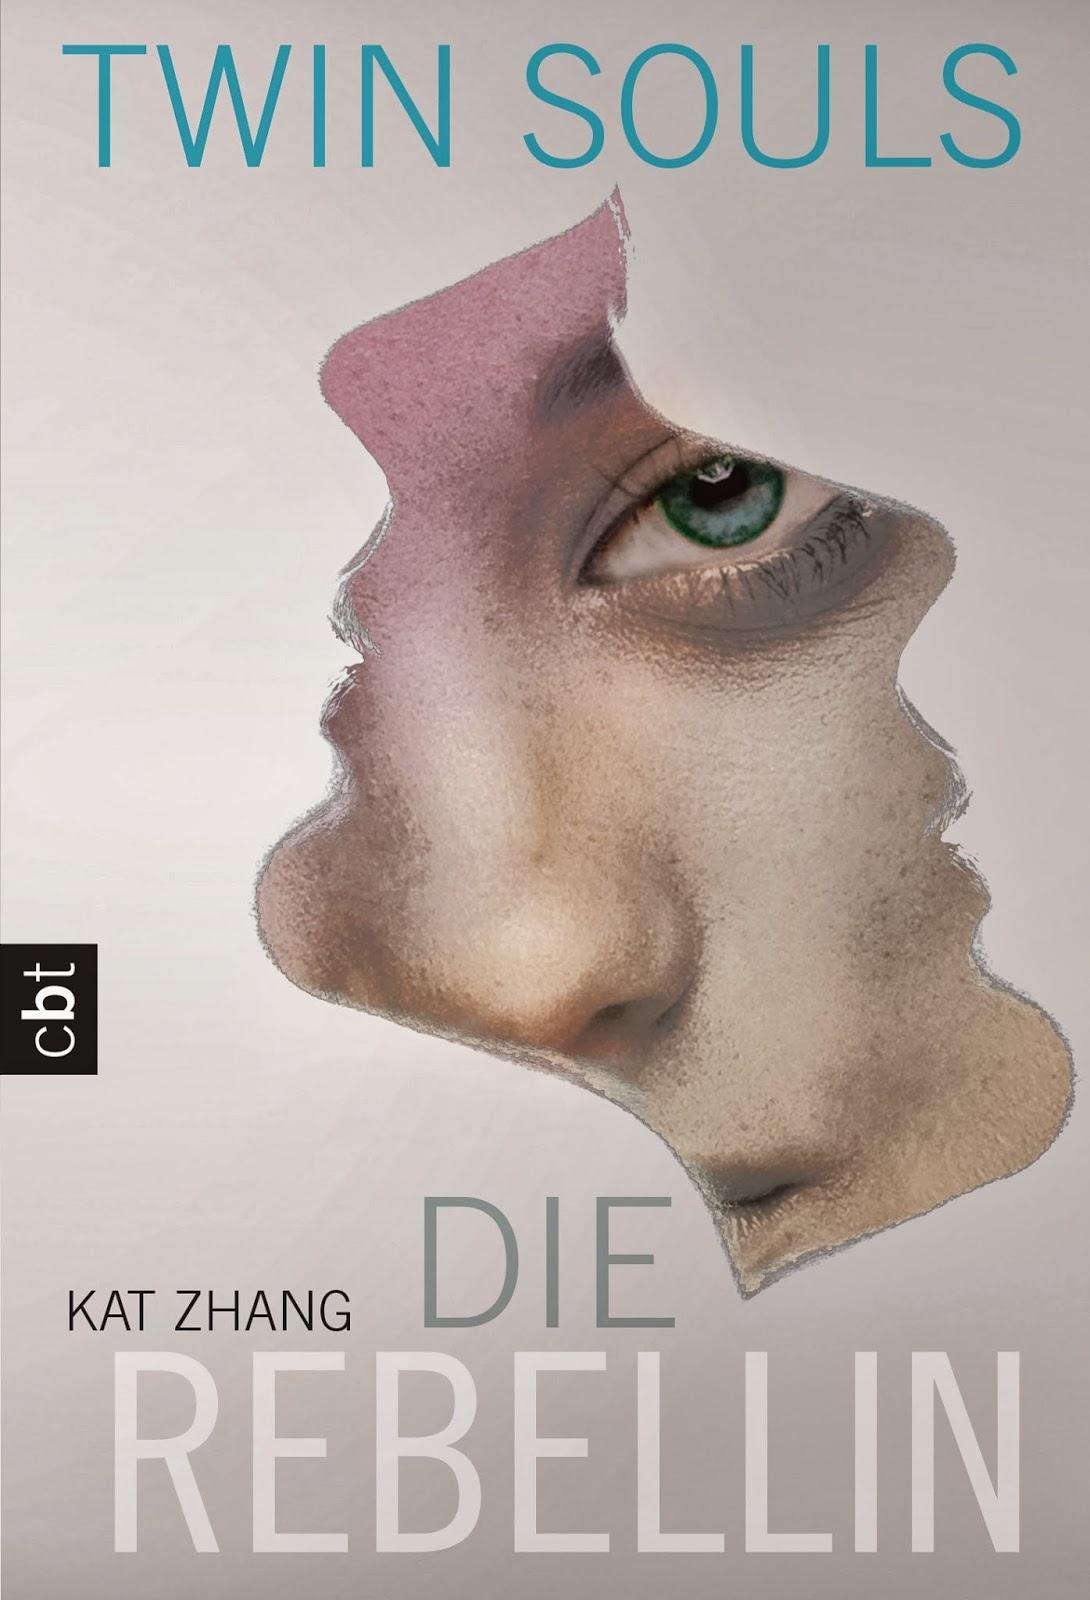 http://www.randomhouse.de/content/edition/covervoila_hires/Zhang_KTwin_Souls_2_139534.jpg